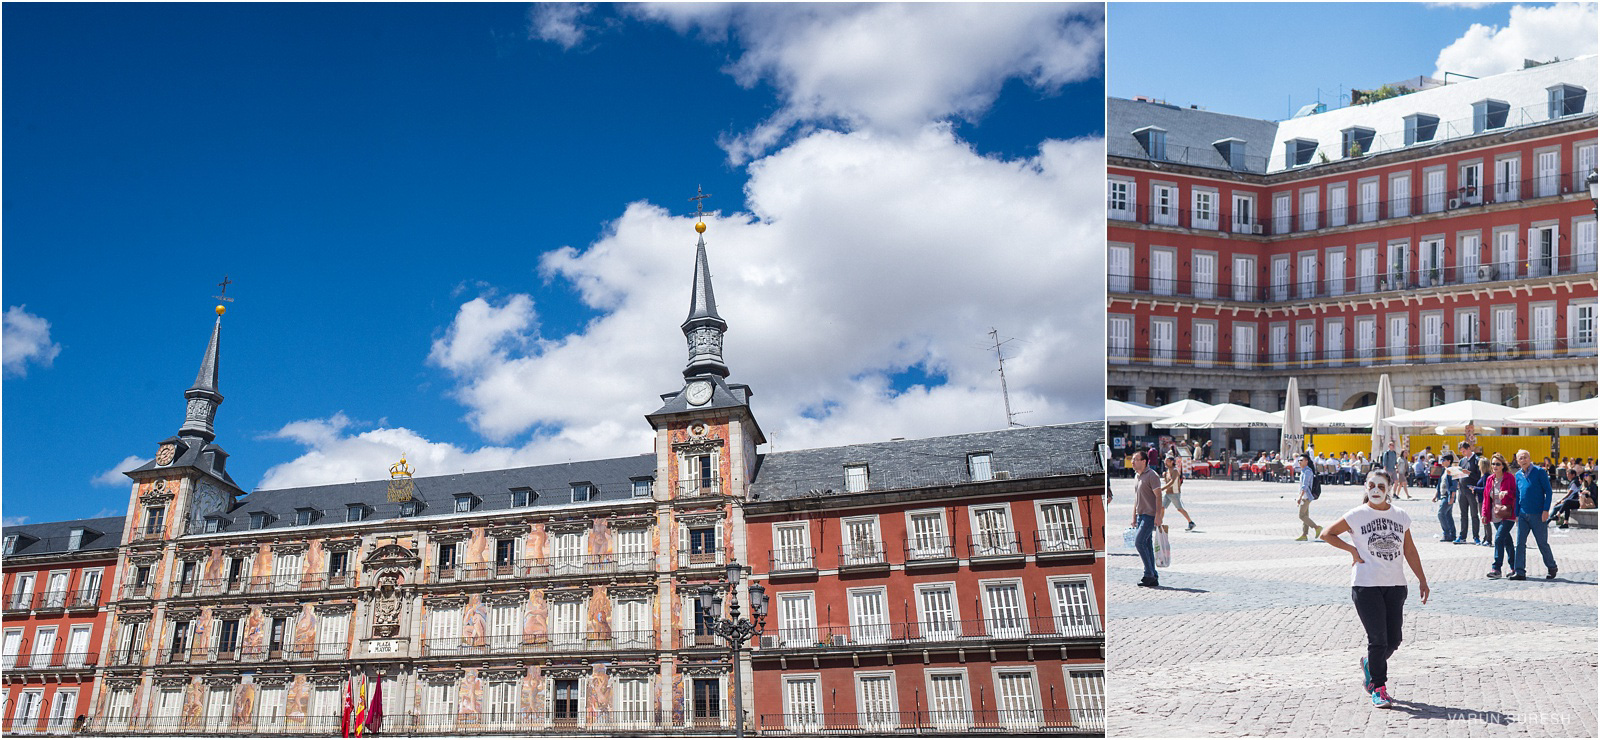 Spain_Portugal_2015_142_Blog.jpg